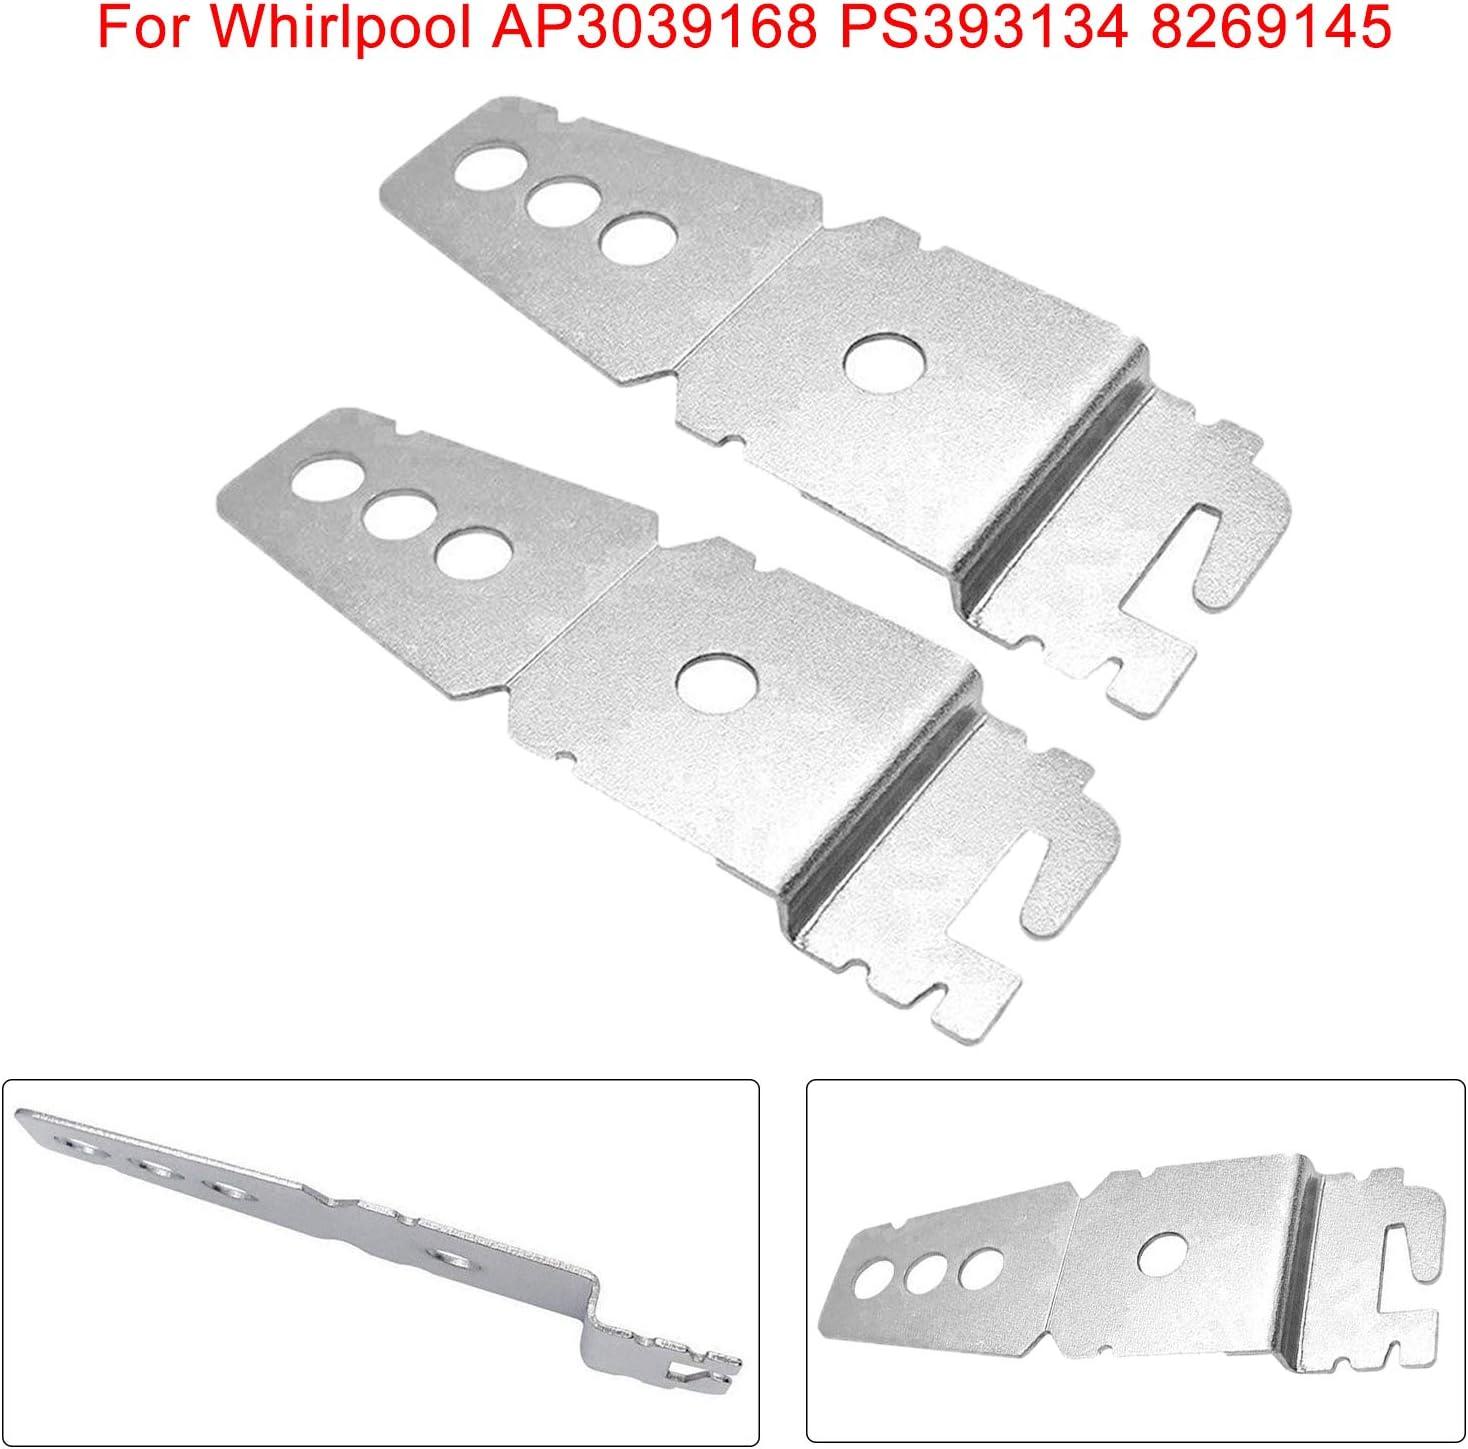 8269145 - Soporte de montaje para lavavajillas para Whirlpool ...